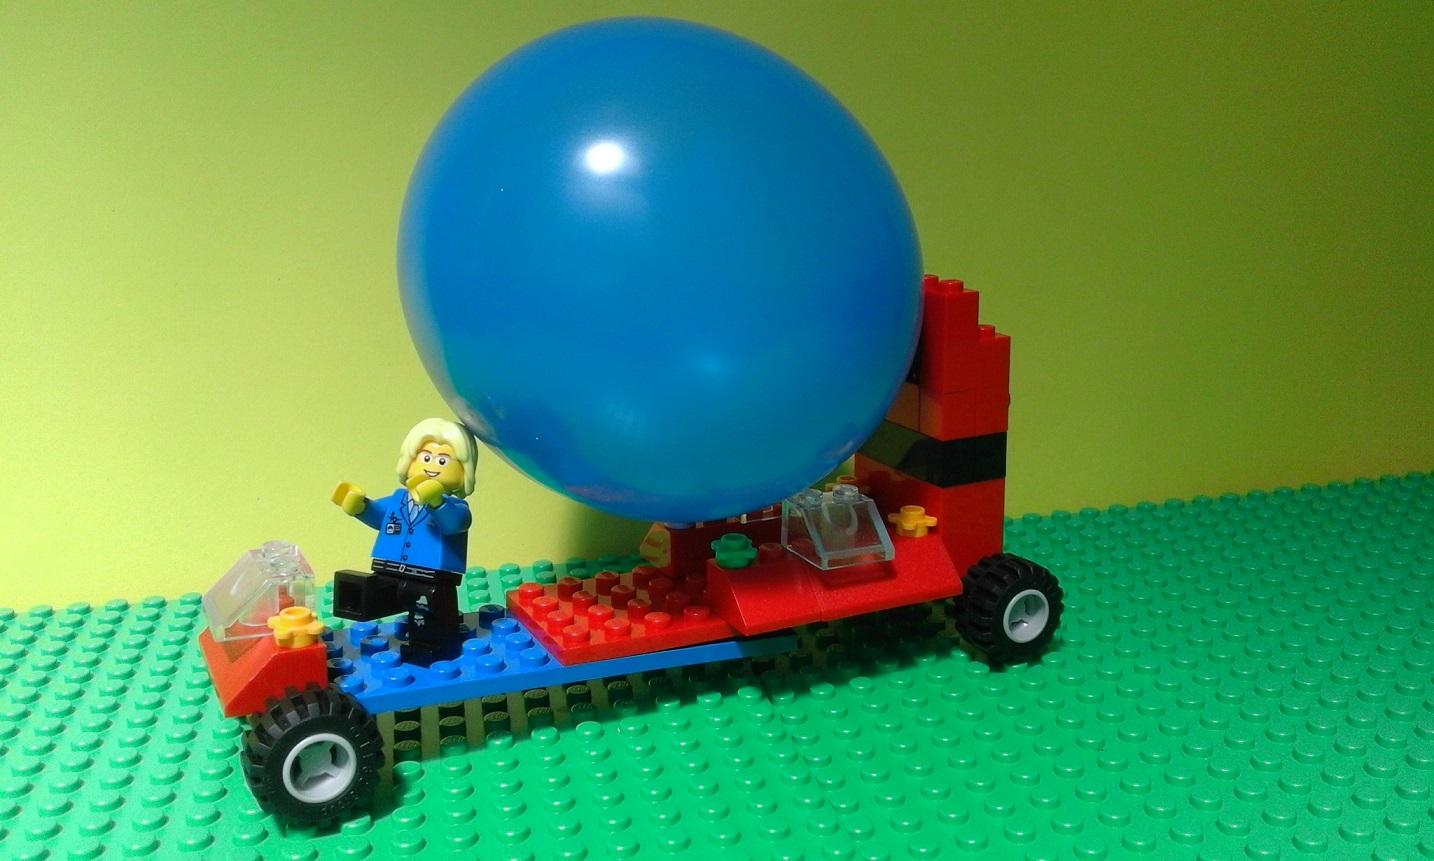 balloon powered car Table 1: materials used to build balloon car material description amount use 1/8 x 3 x 36 balsa plank 1 car body 1/4 x 1/2 x 36 balsa strips 2 balloon stand.